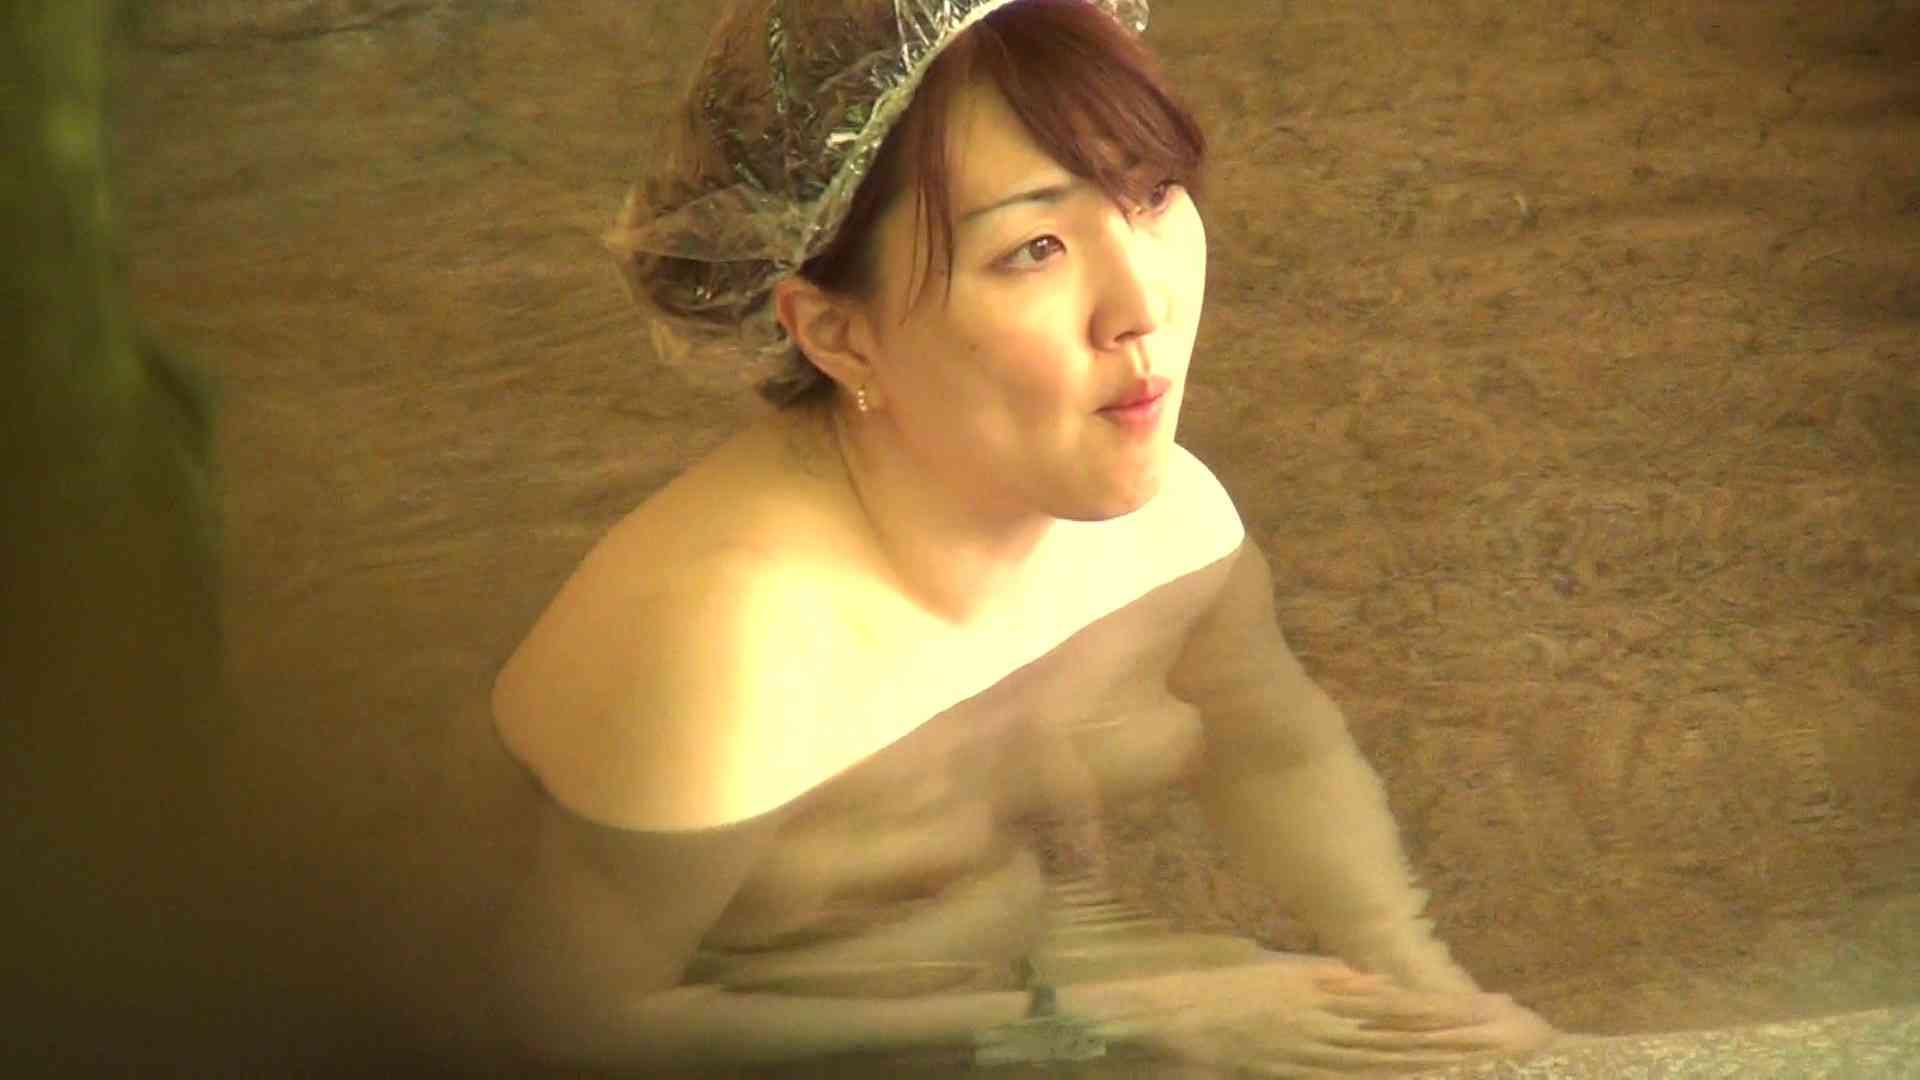 Vol.81 【閲覧注意】極熟肉オンパレード! 露天風呂の女子達 おめこ無修正動画無料 59画像 47